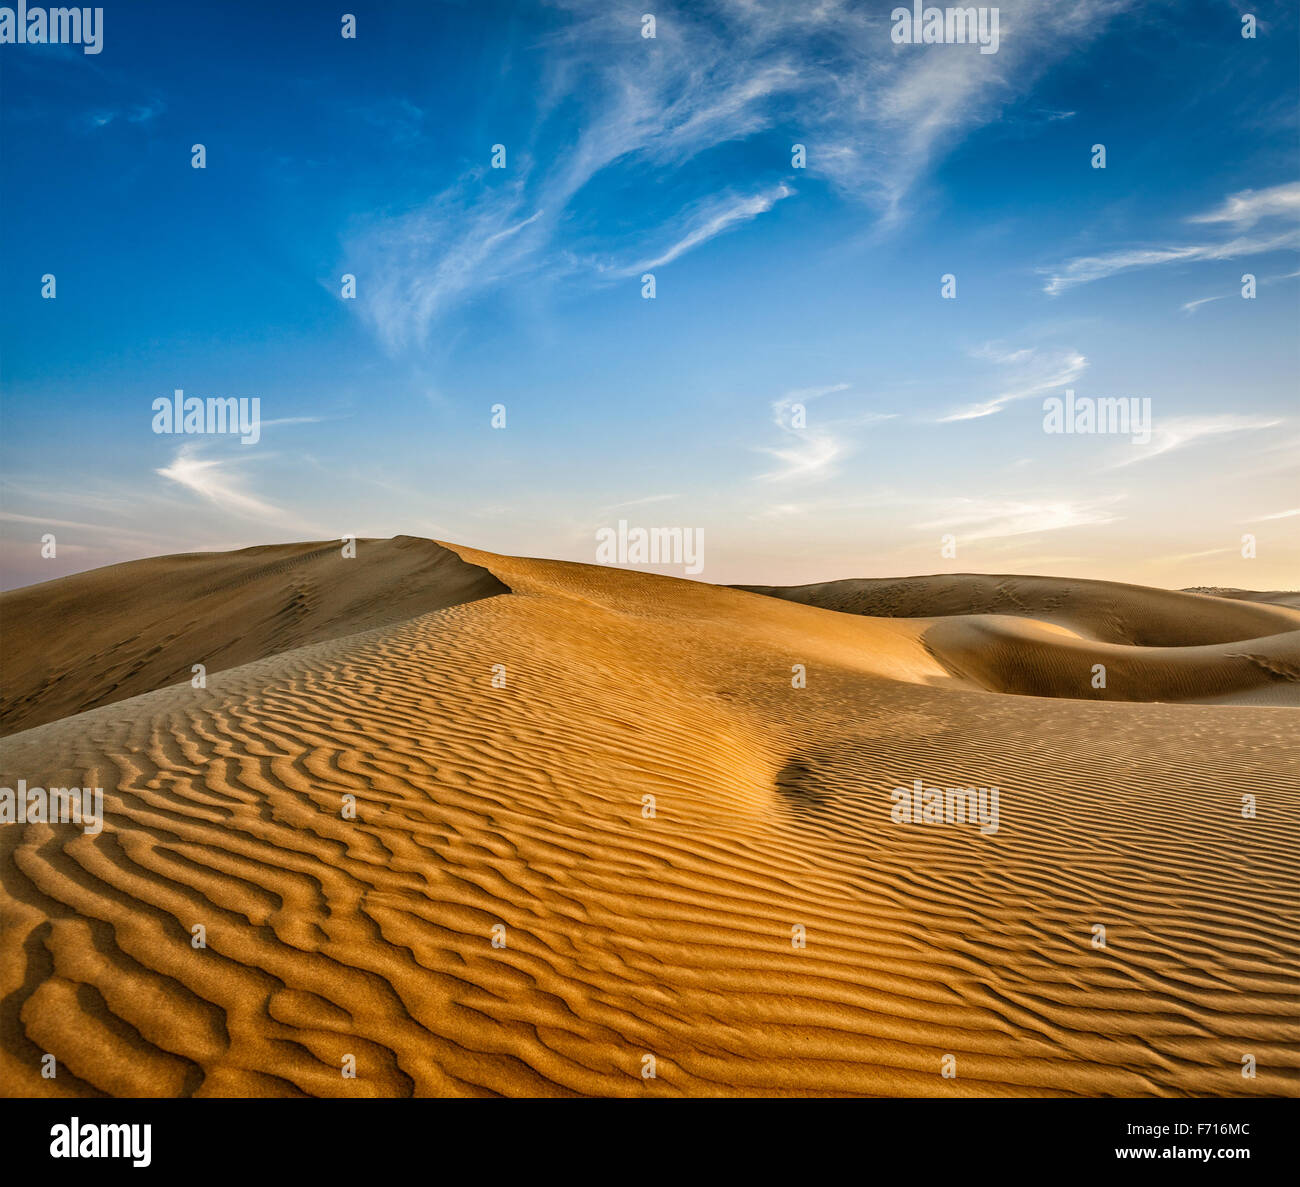 Dunes of Thar Desert, Rajasthan, India - Stock Image